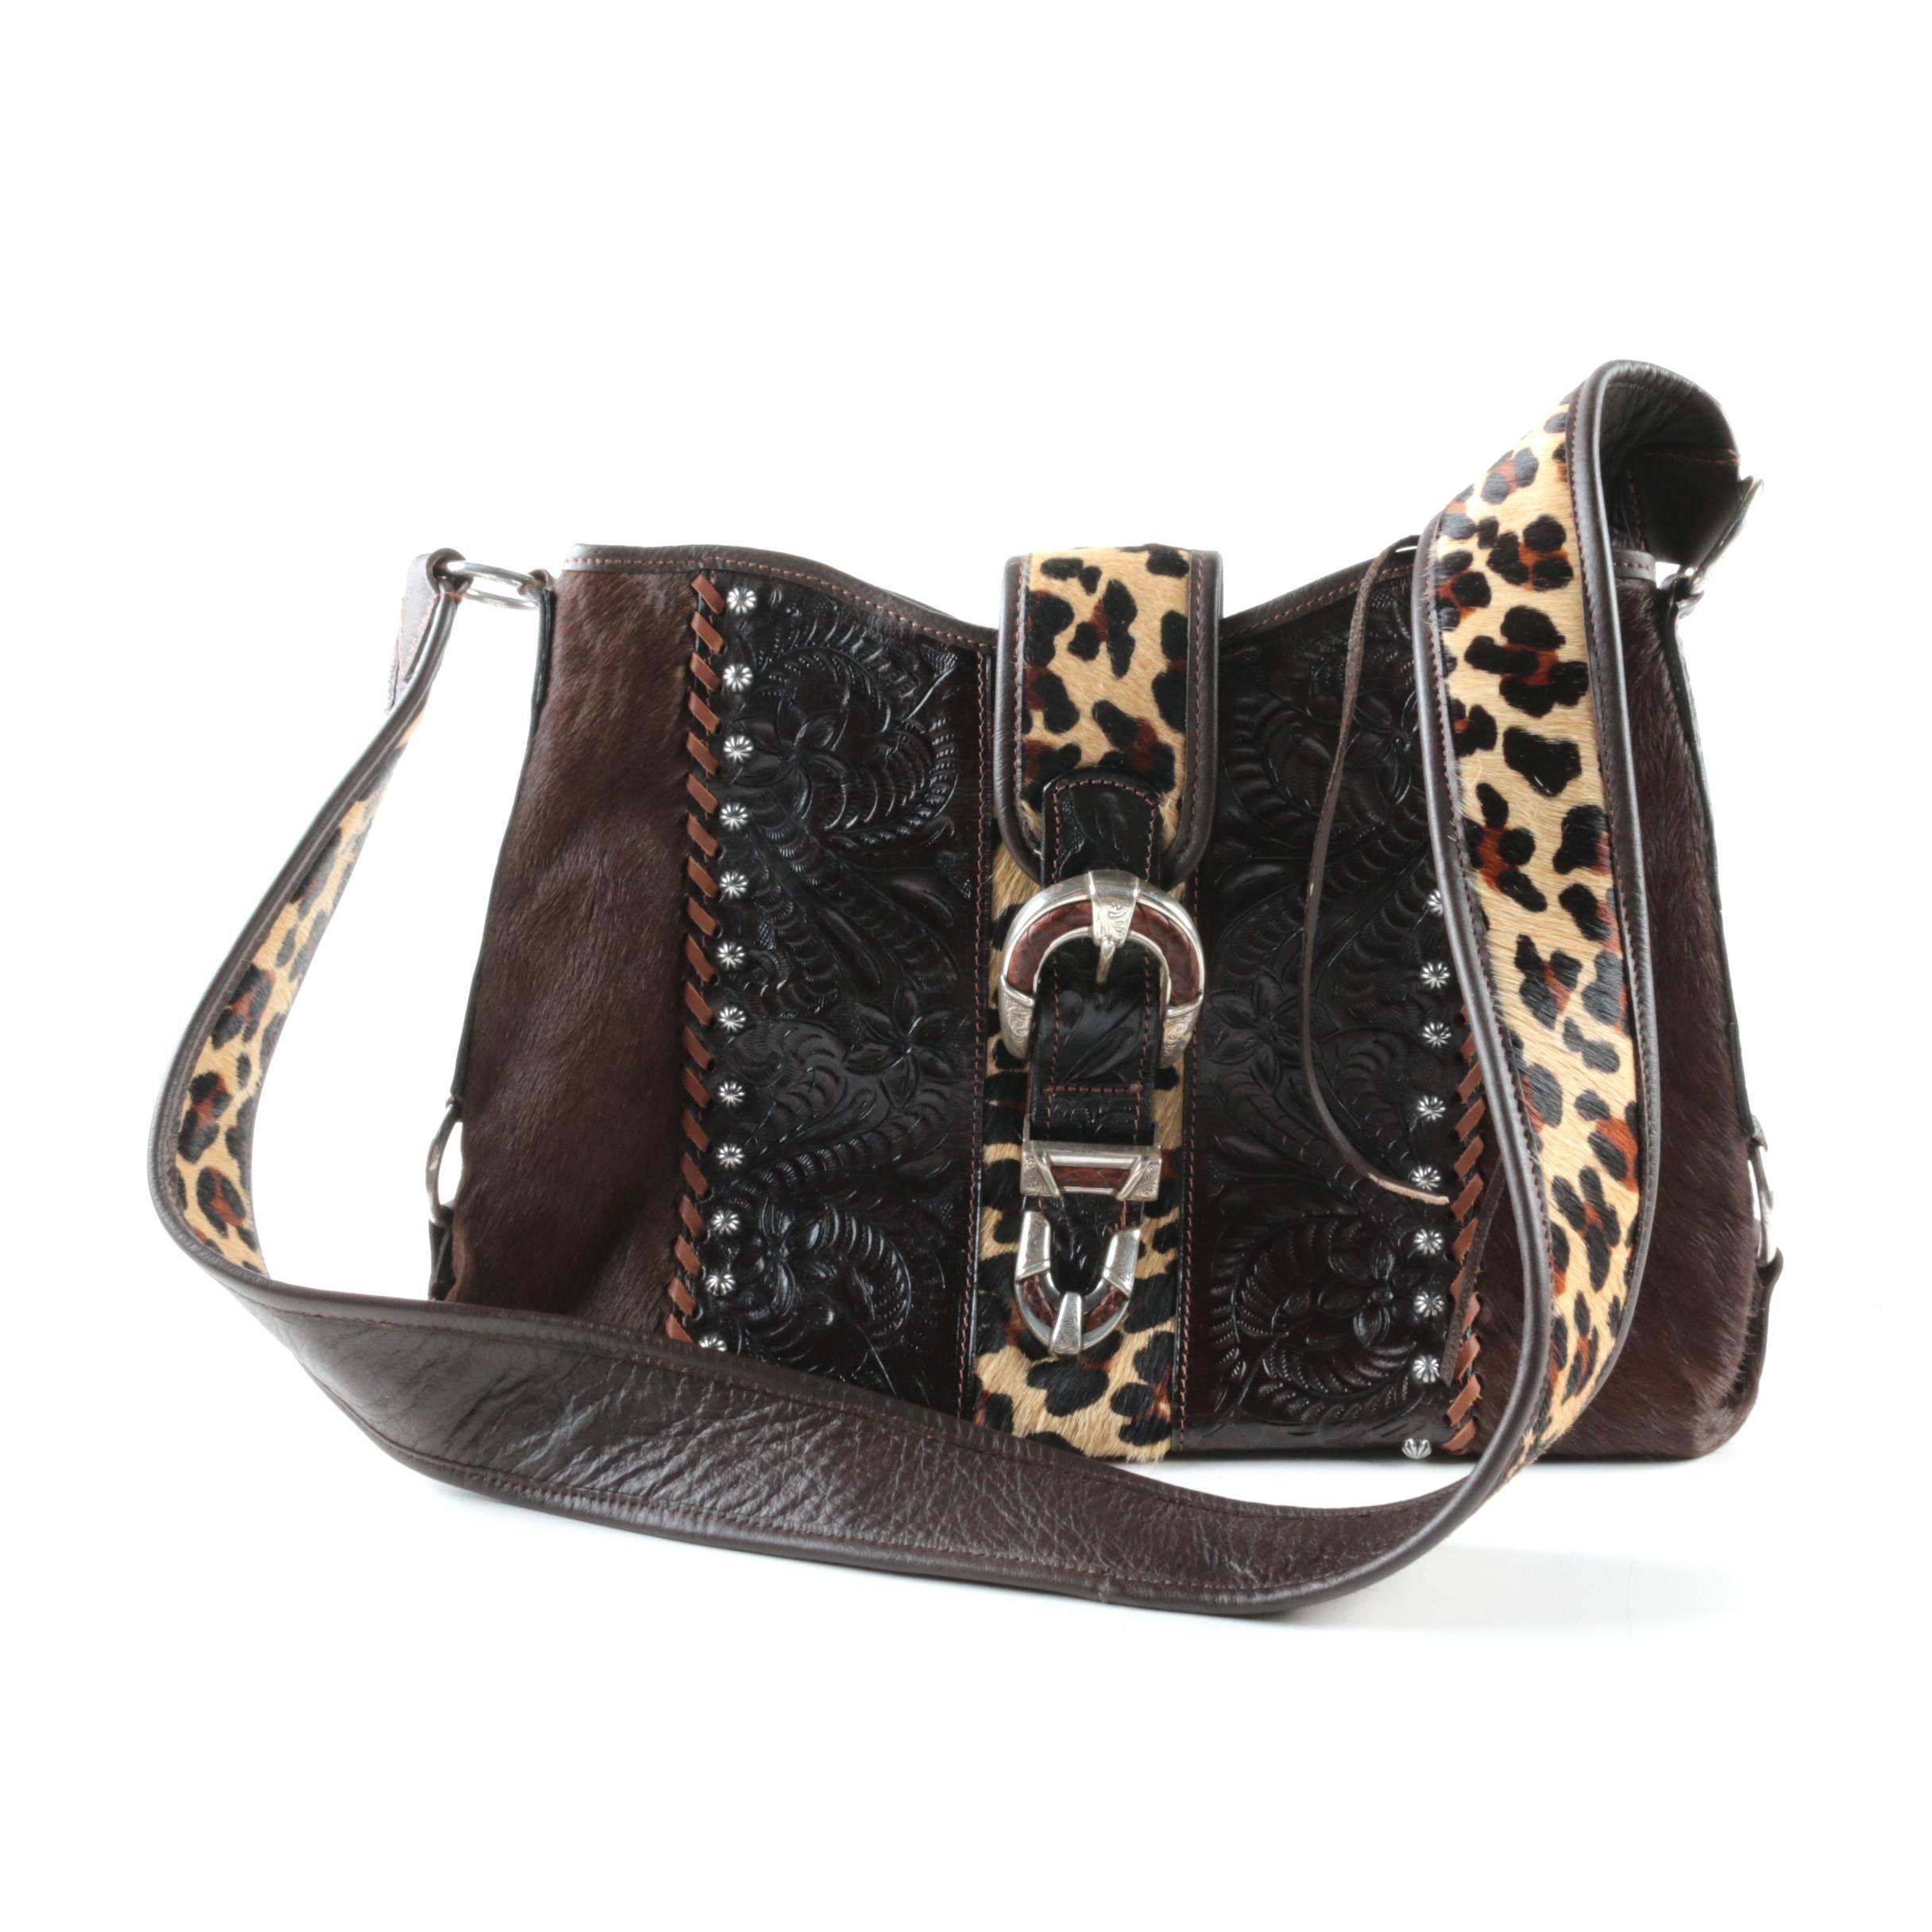 American West Tooled Leather and Animal Print Handbag